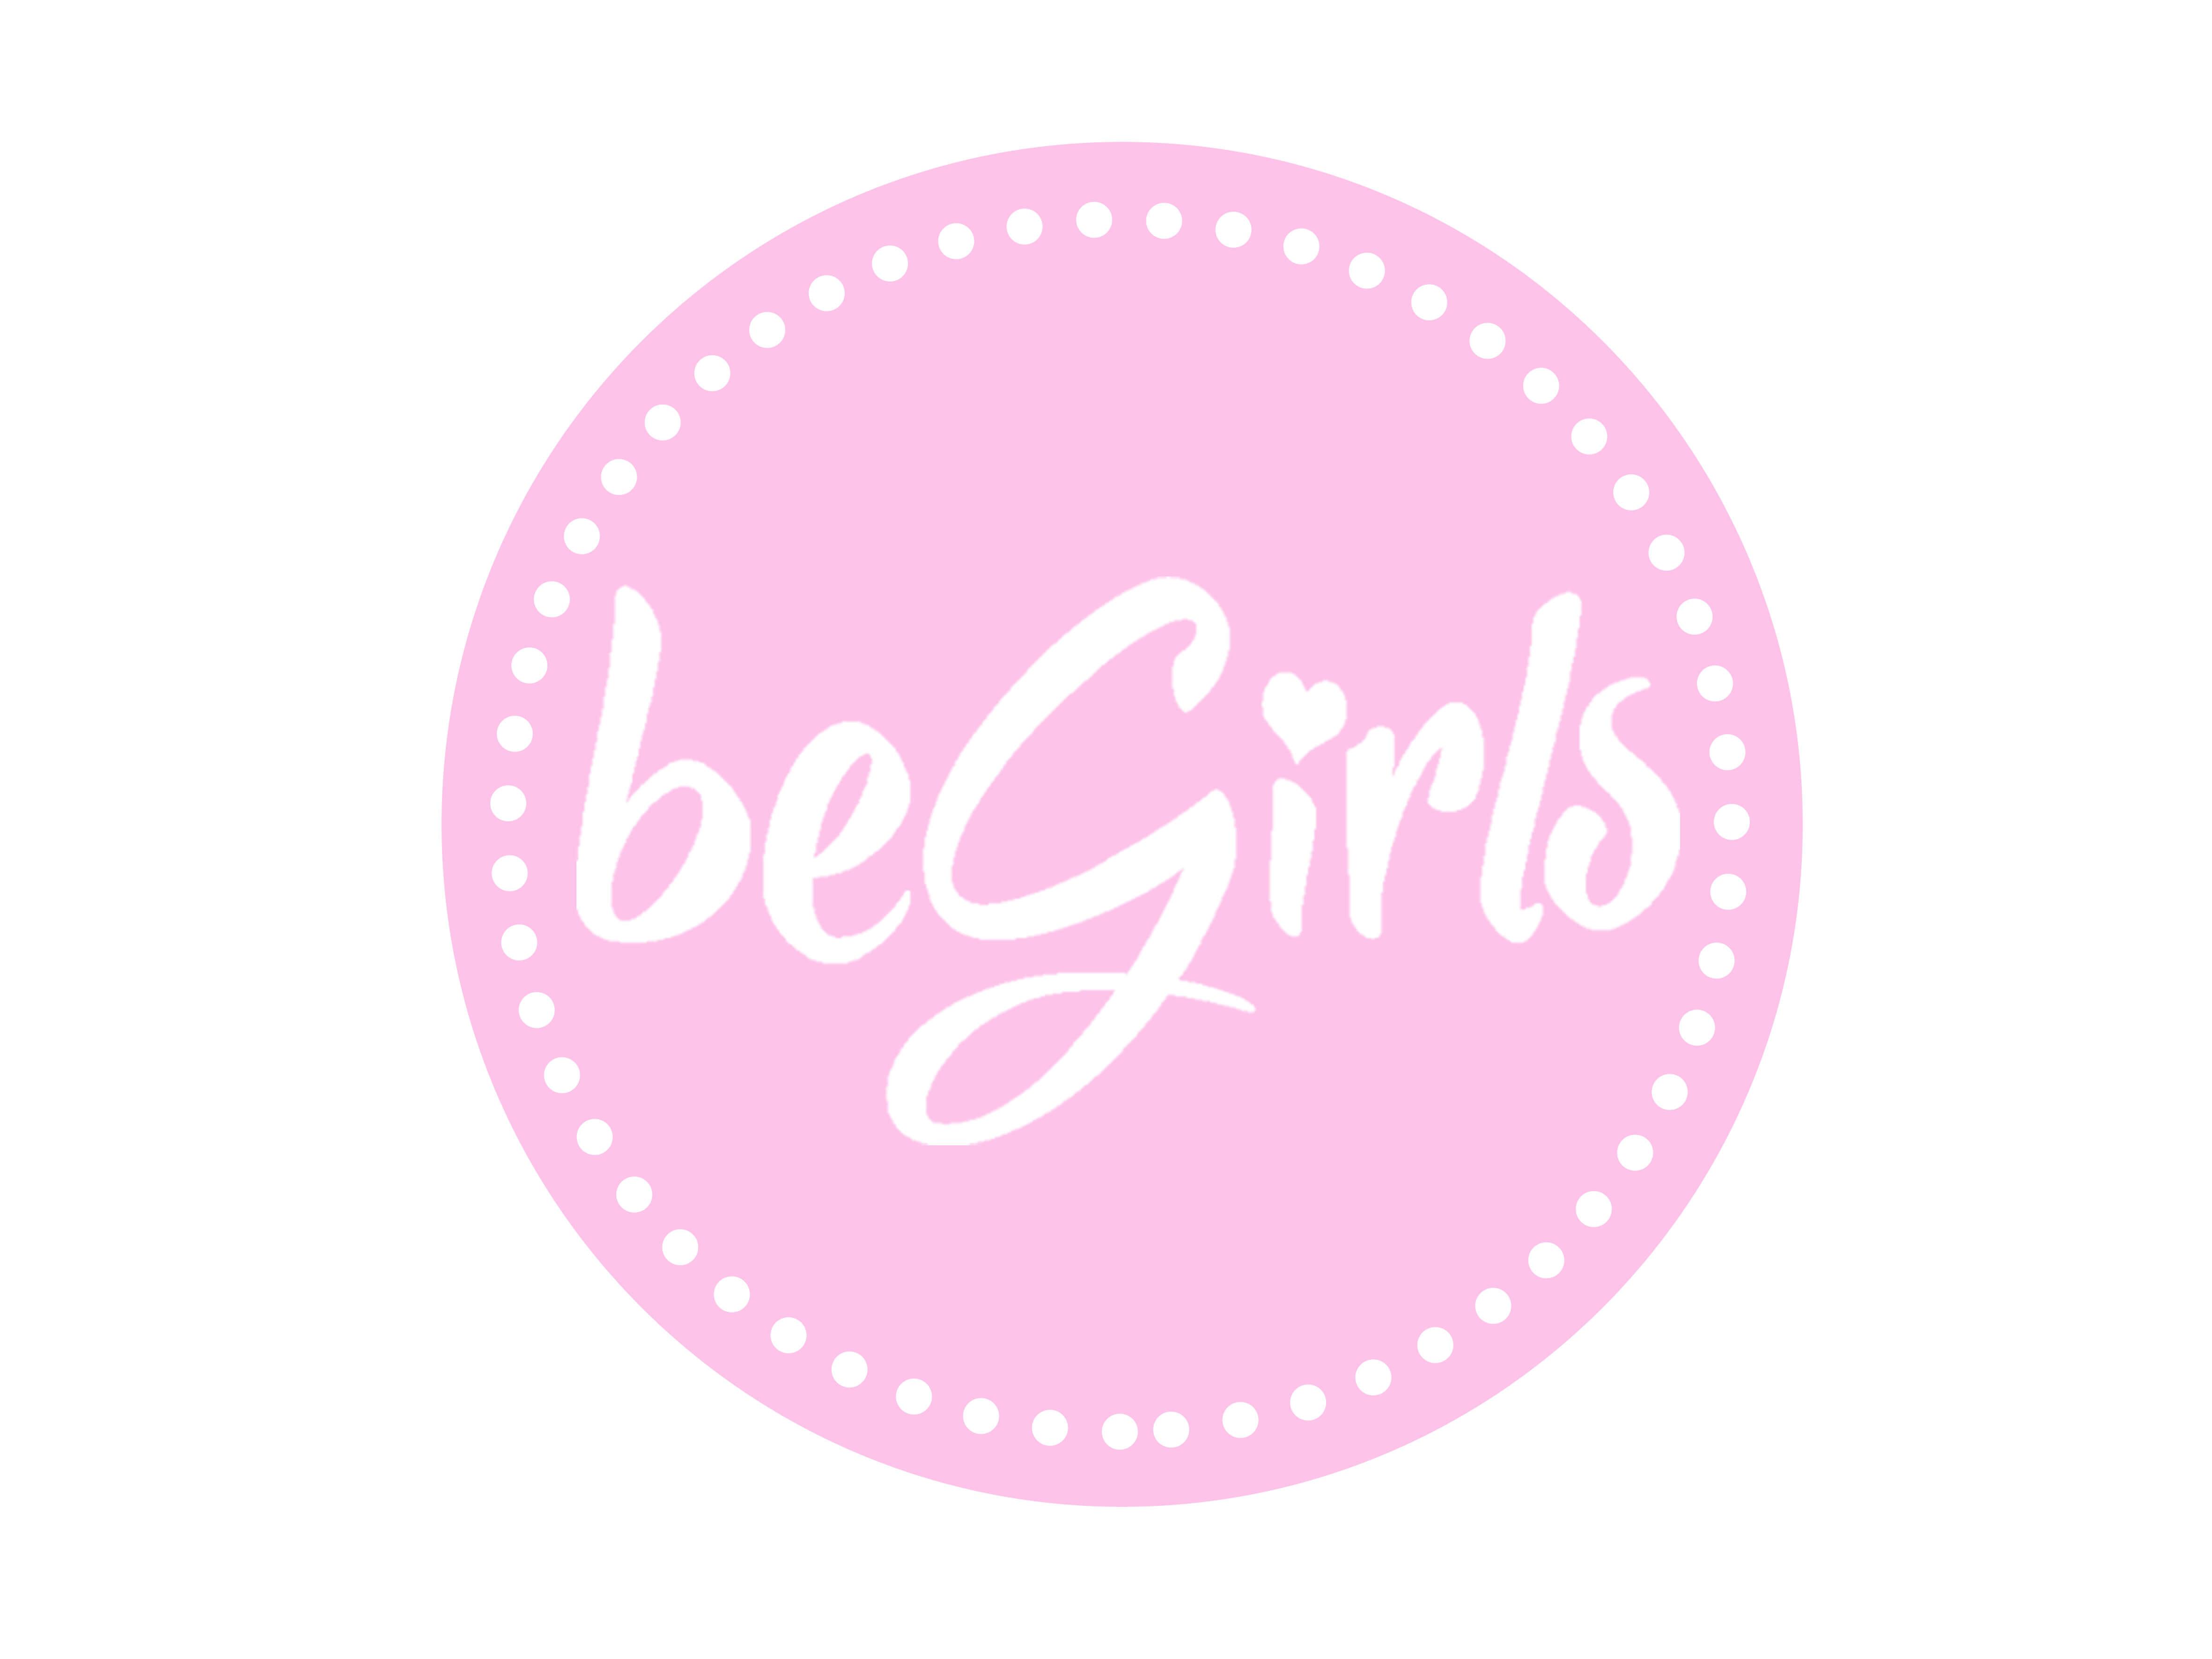 beGirls